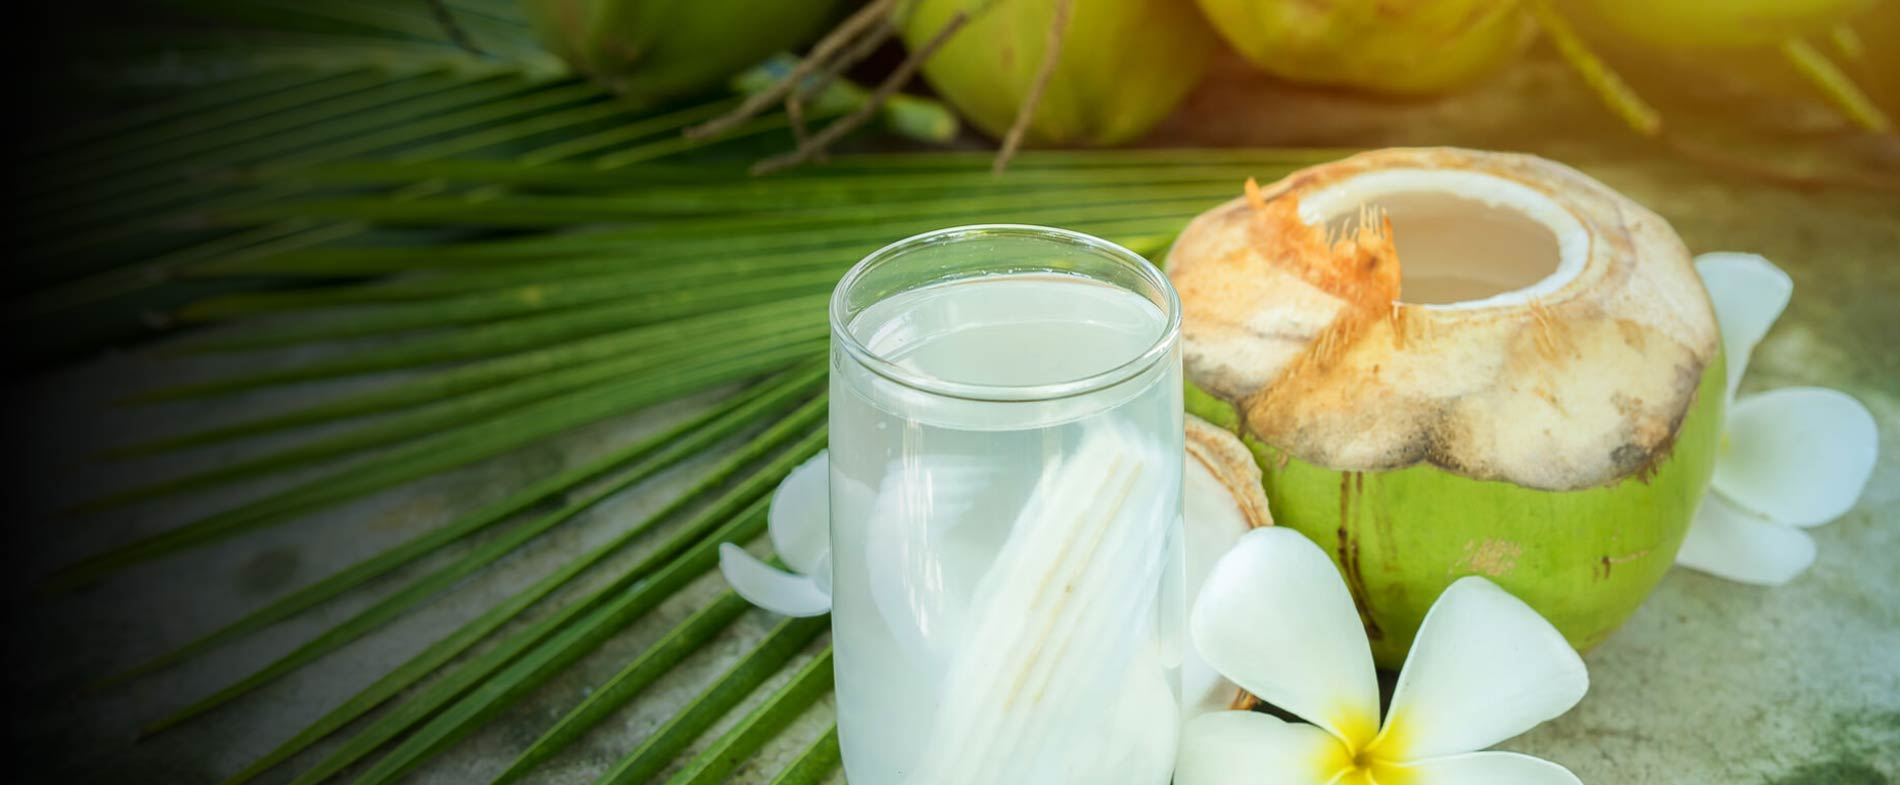 Leckerer Durstlöscher aus den Tropen